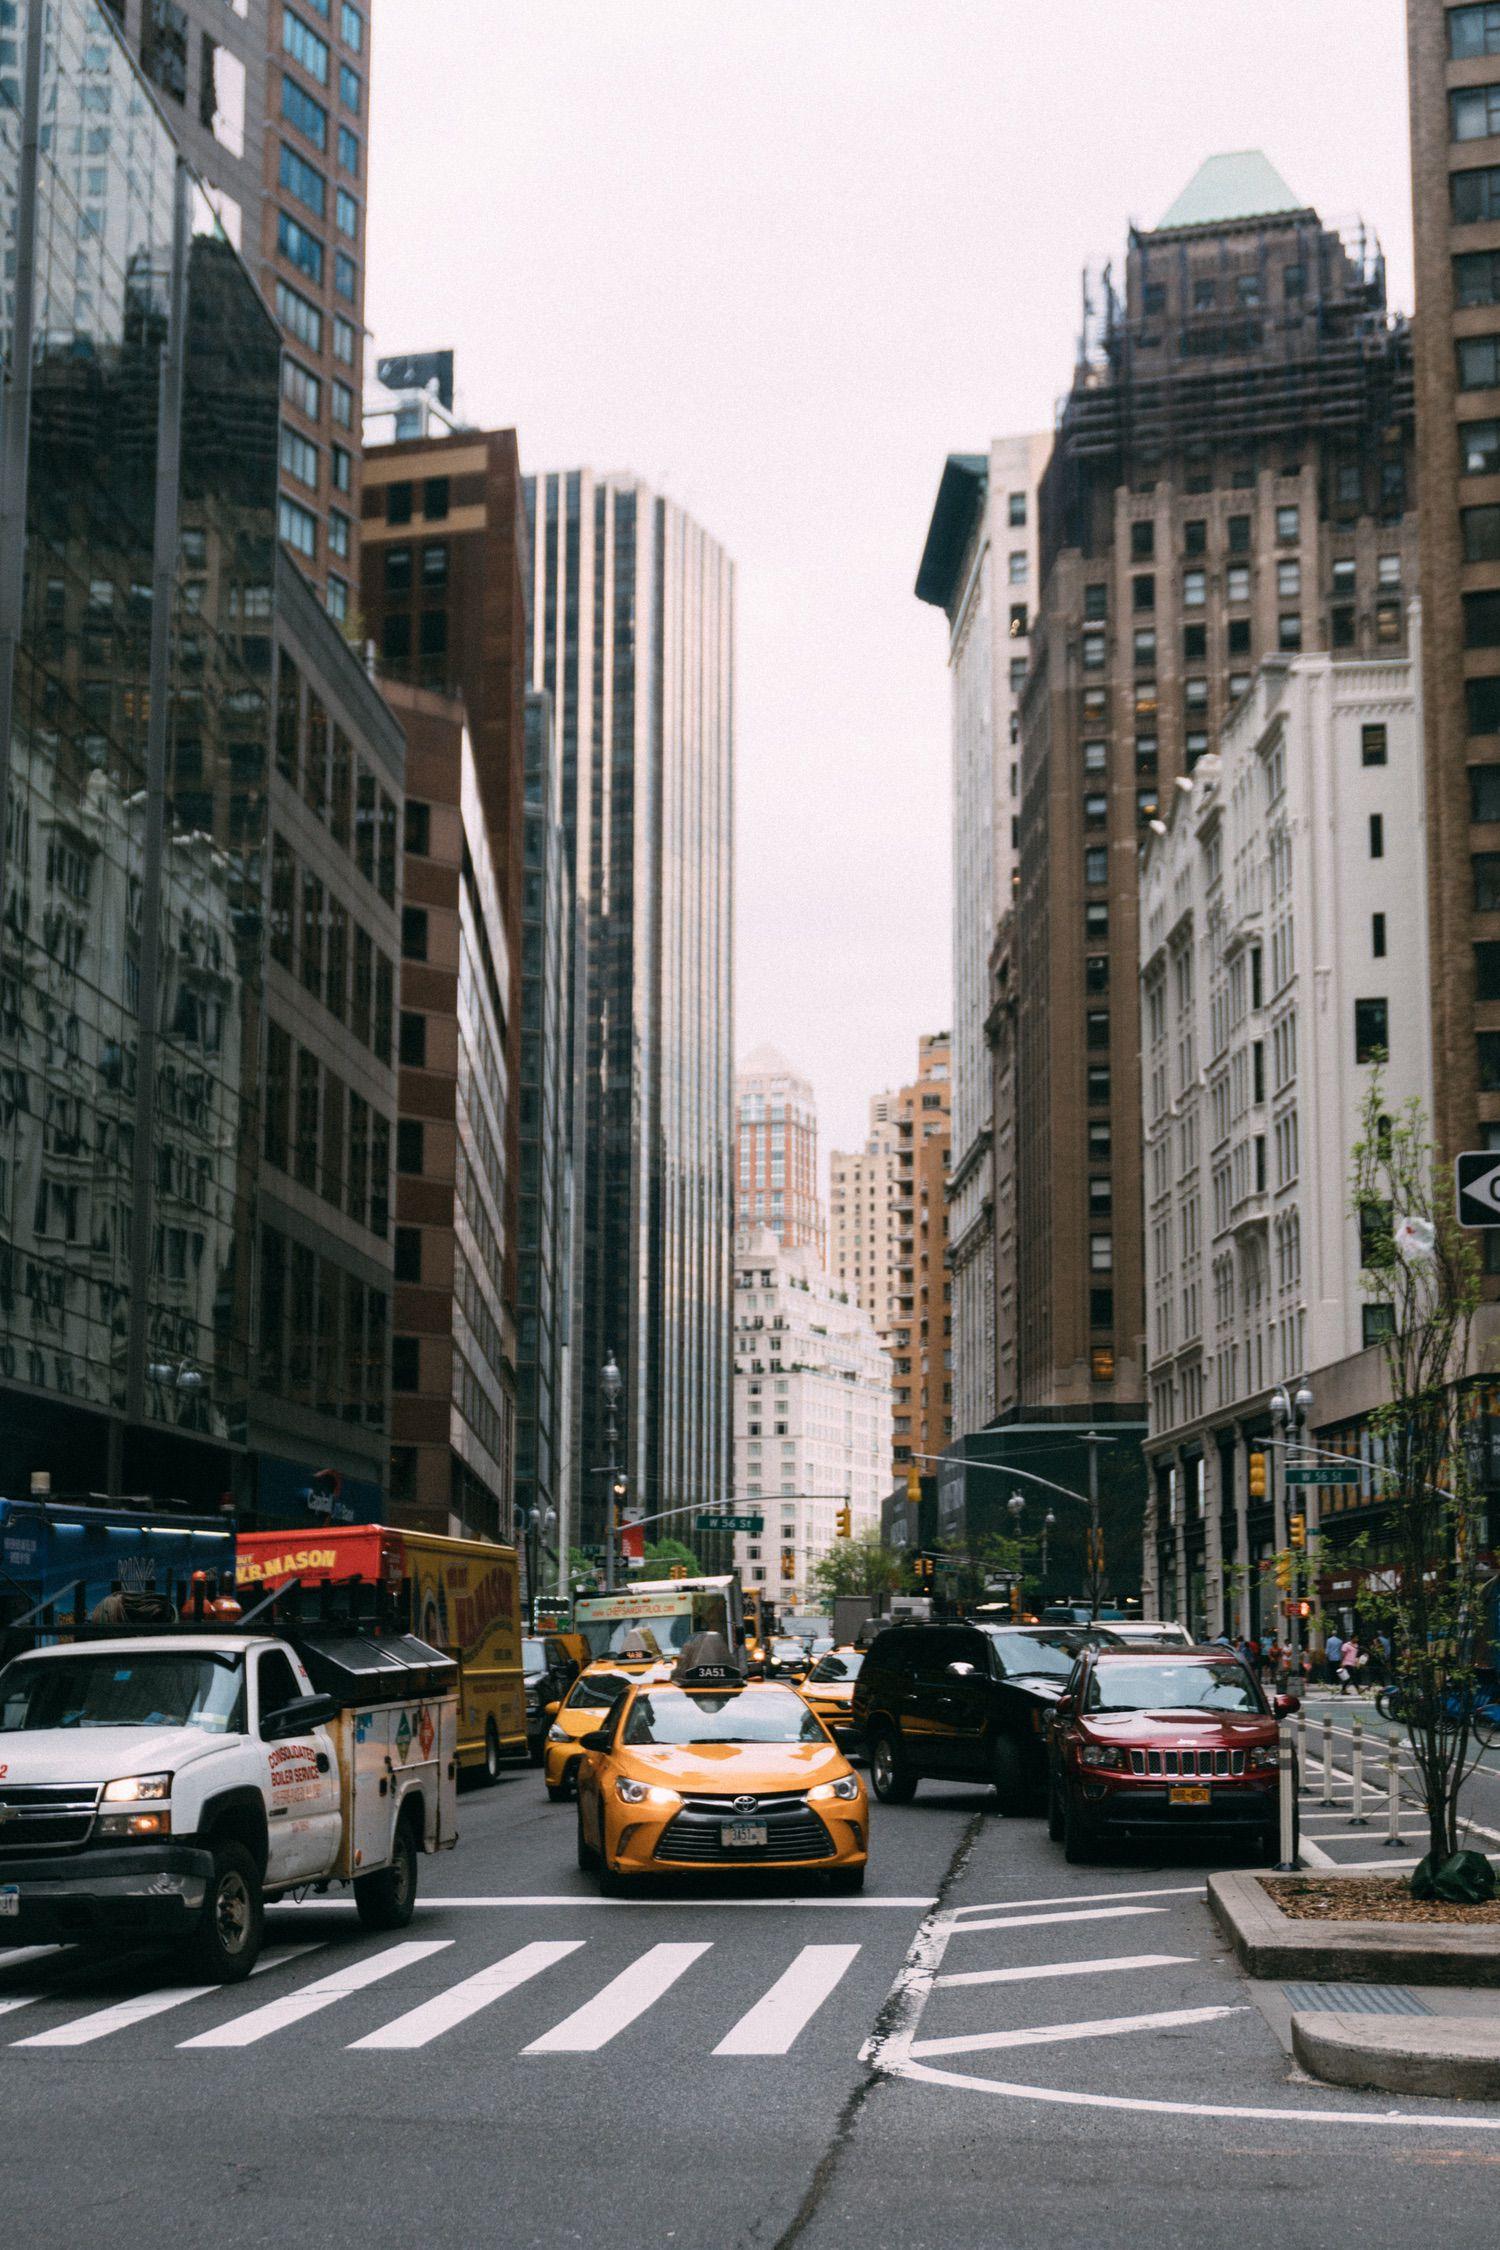 Manhattan bustle - New York City.